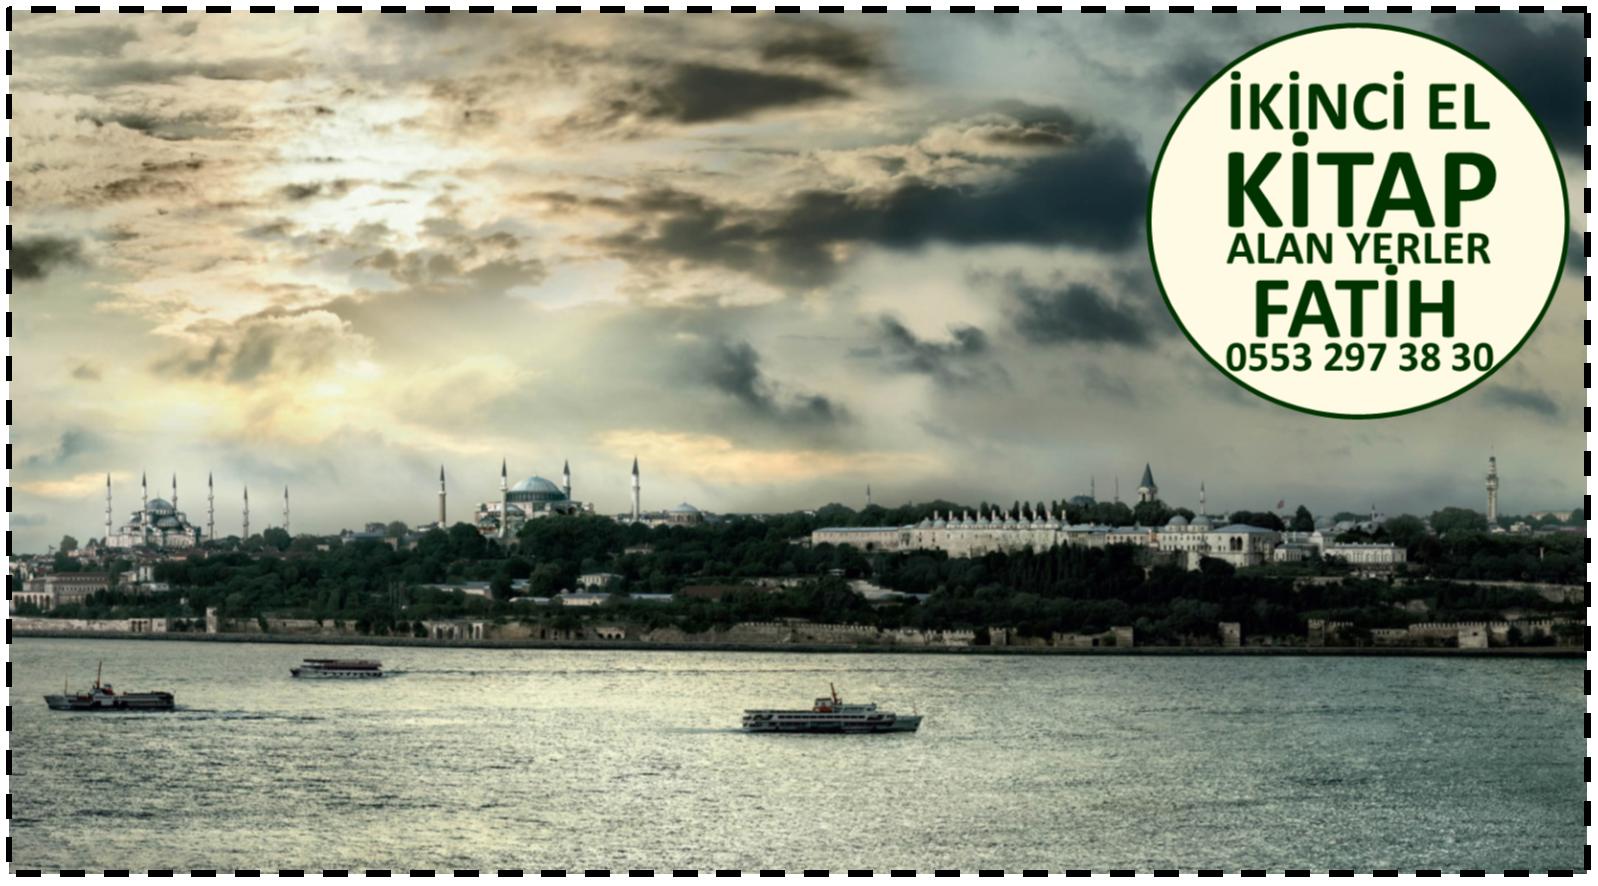 İkinci El Kitap Alan Yerler Fatih / İstanbul - 0553 297 38 30